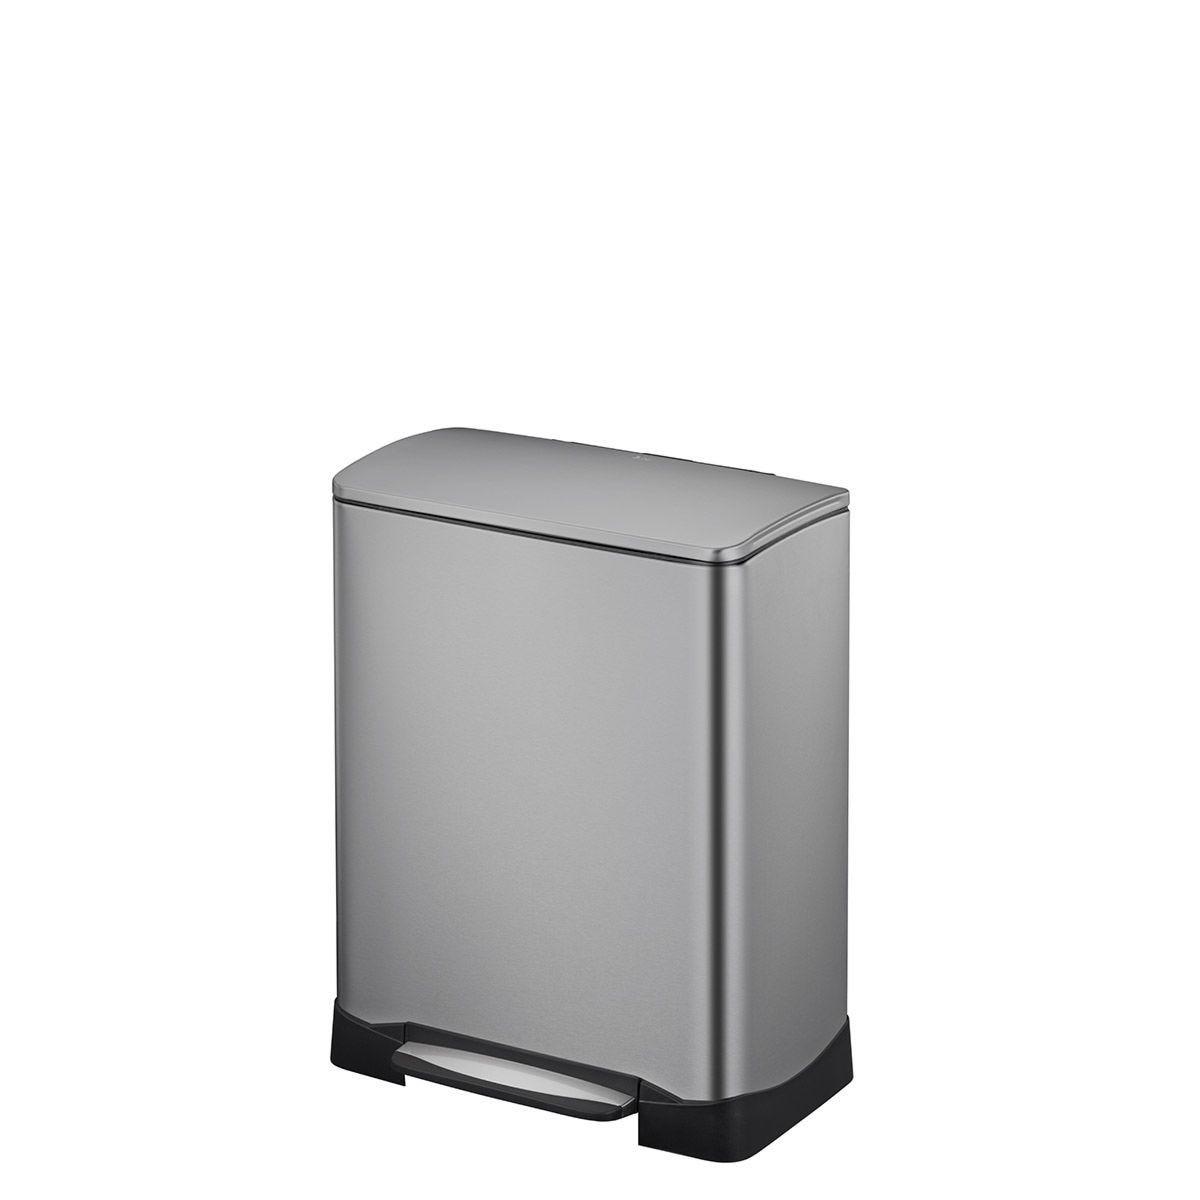 EKO Neo-Cube 28+18L Recycling Bin - Matte Grey